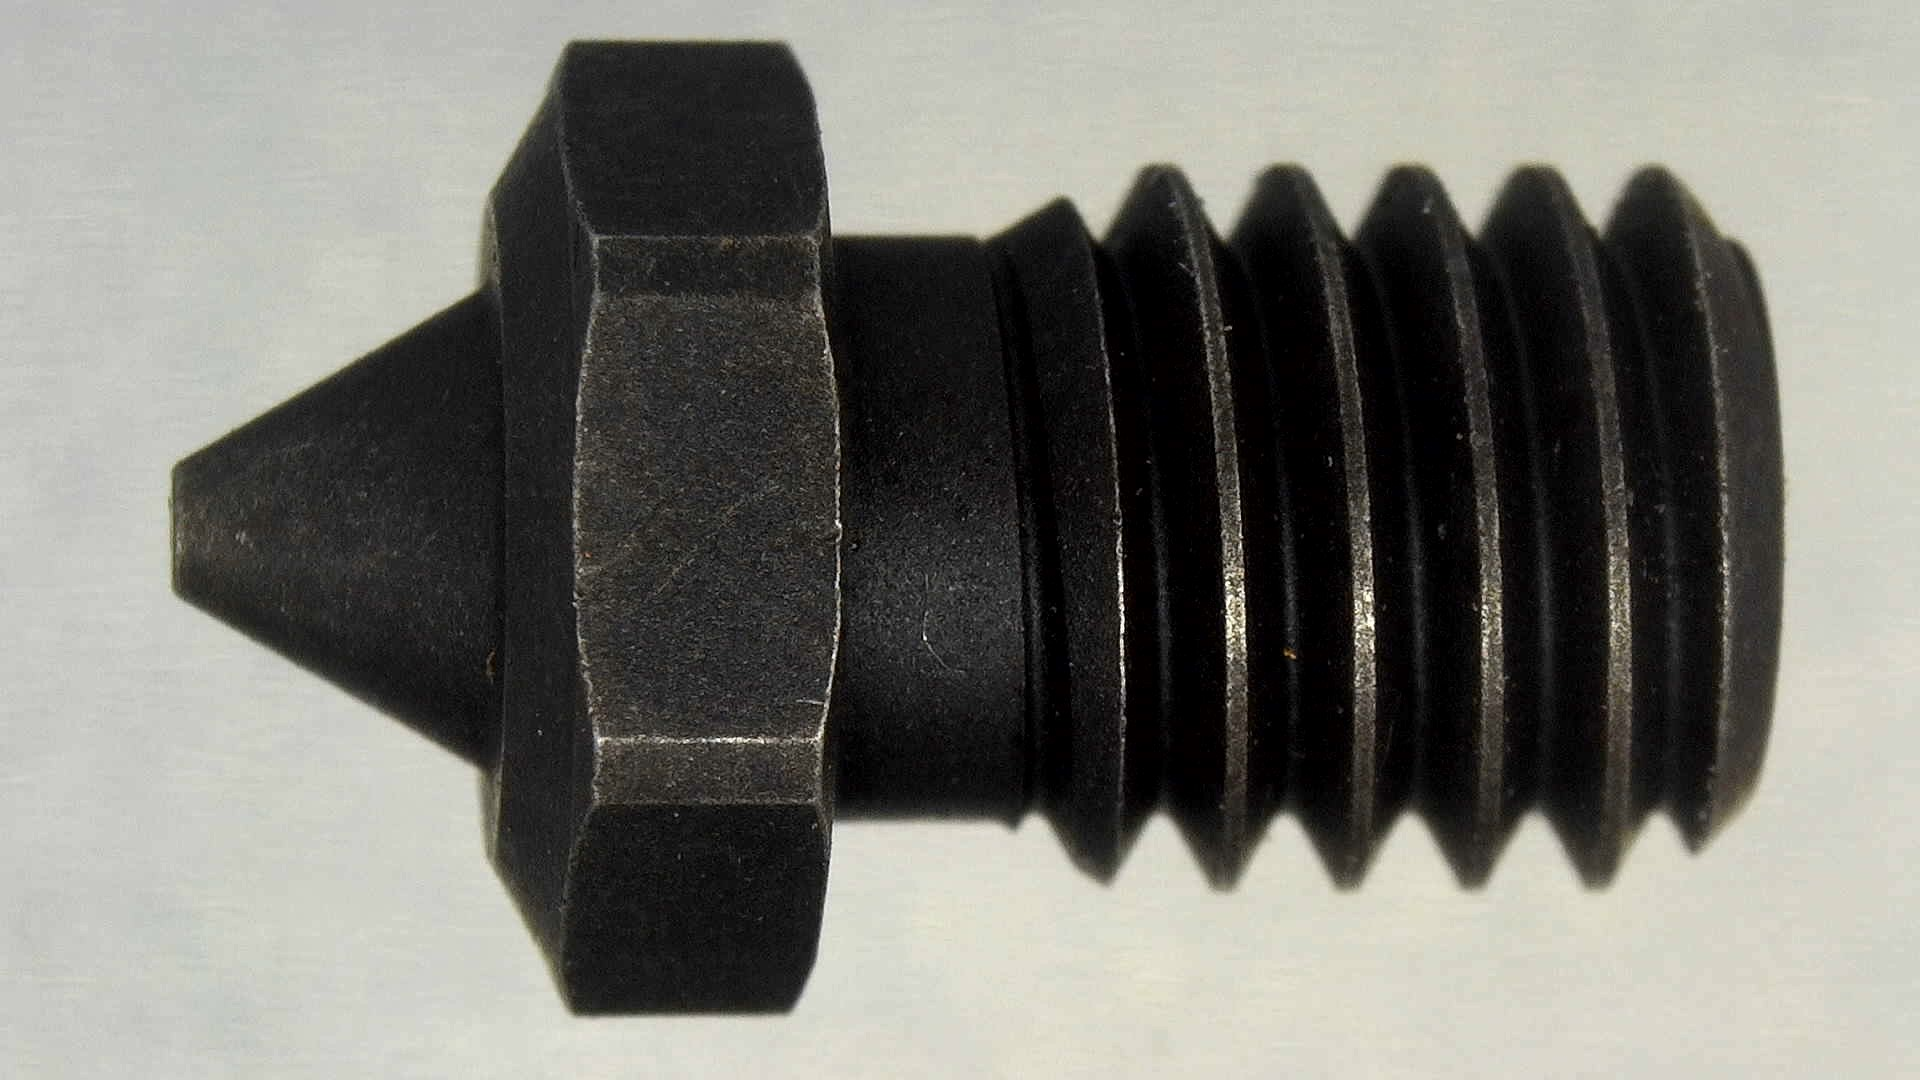 Mellow-NF-V6-Sharp-A2-Hardened-Steel-Nozzle-2-3D Printer Nozzle Comparison